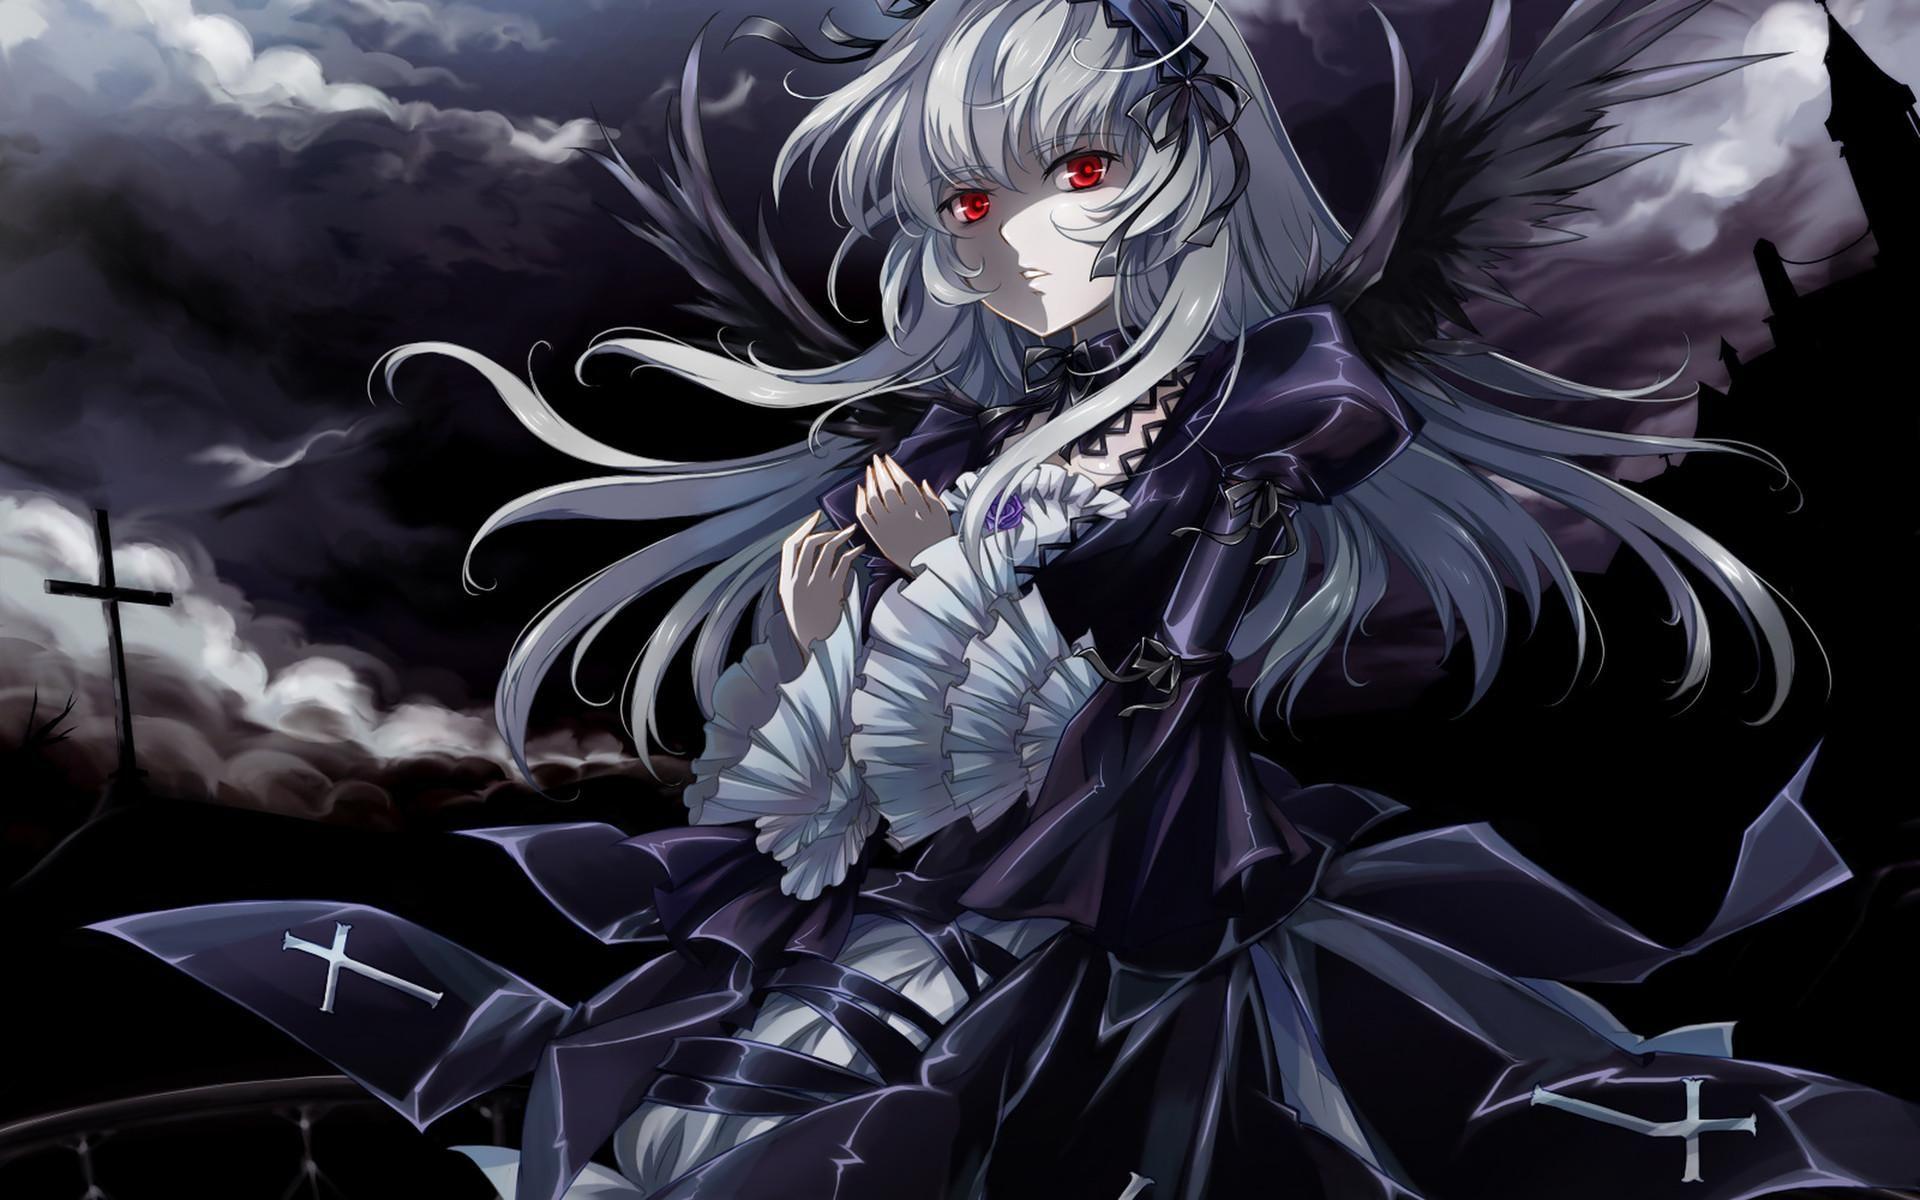 dark+anime Dark, anime, black, dark, girl, red eyes